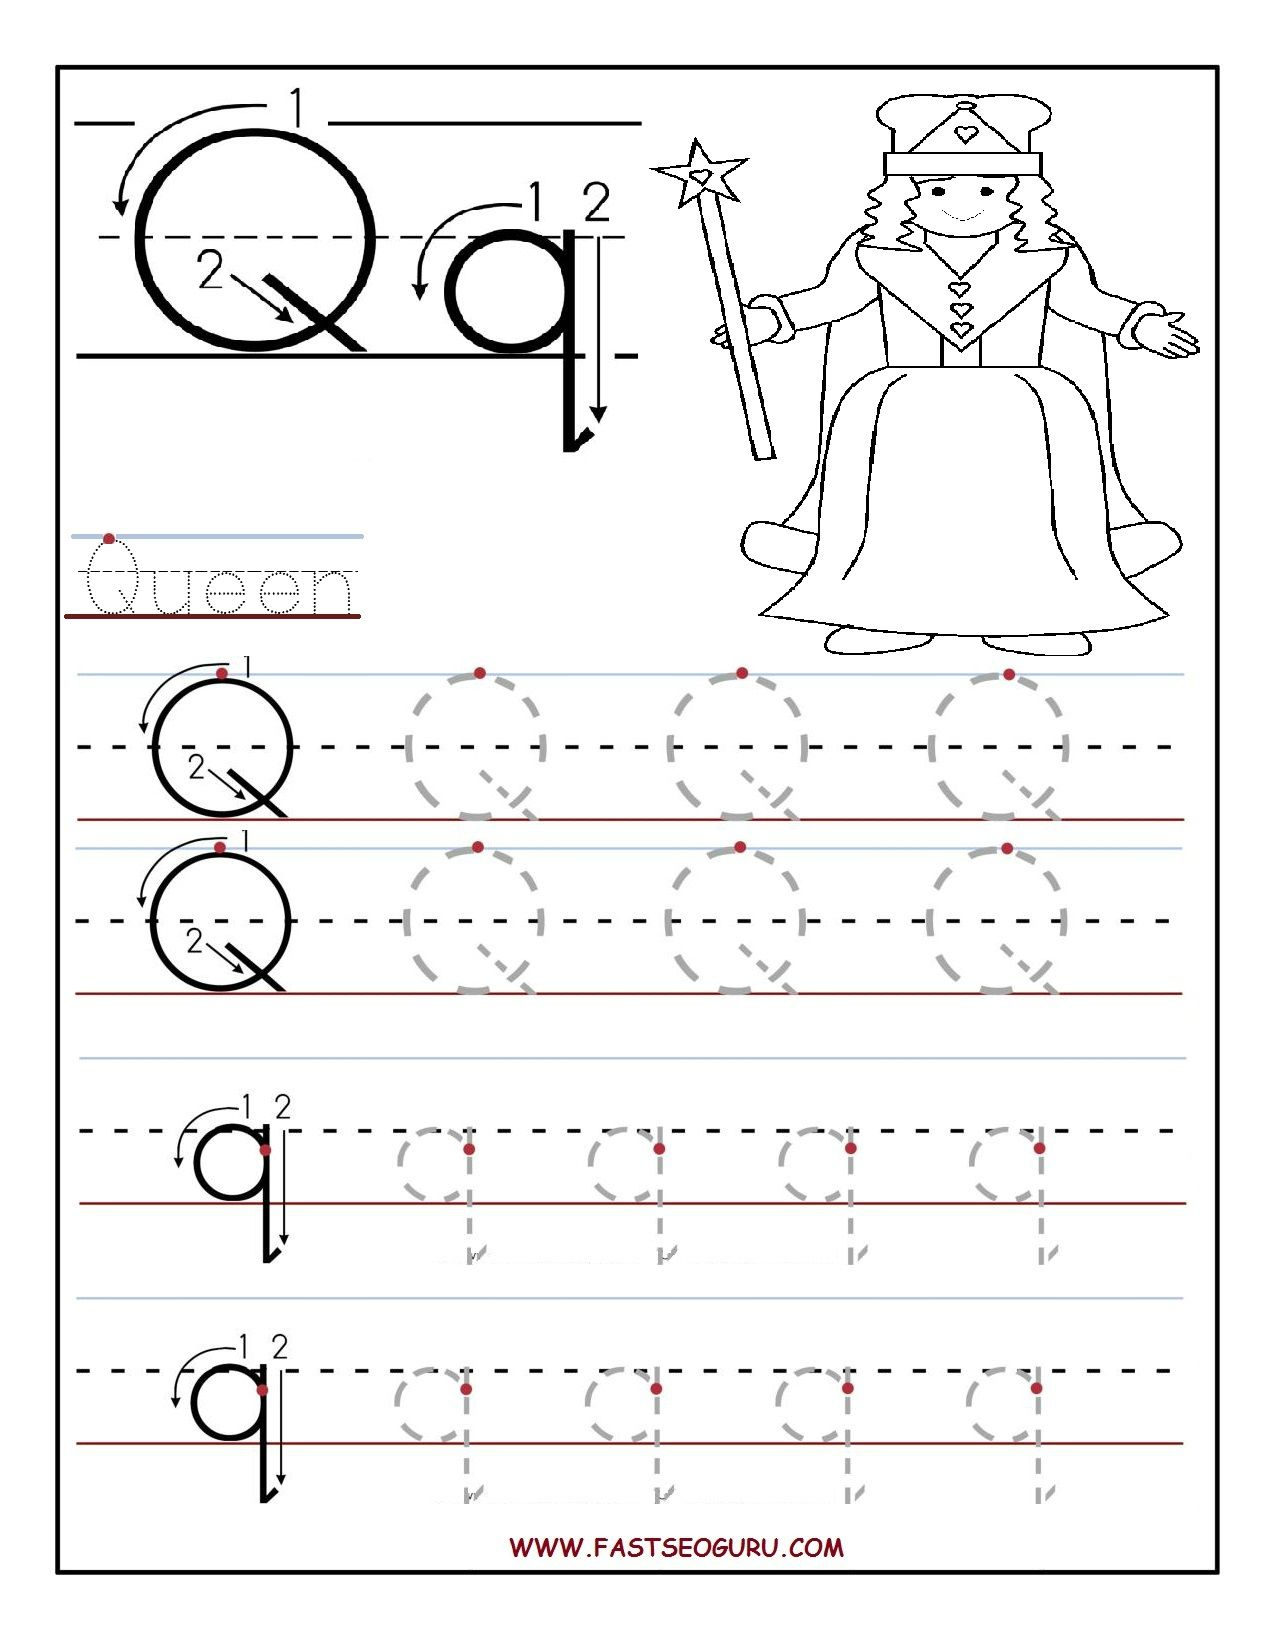 Letter Tracing Worksheets Australia